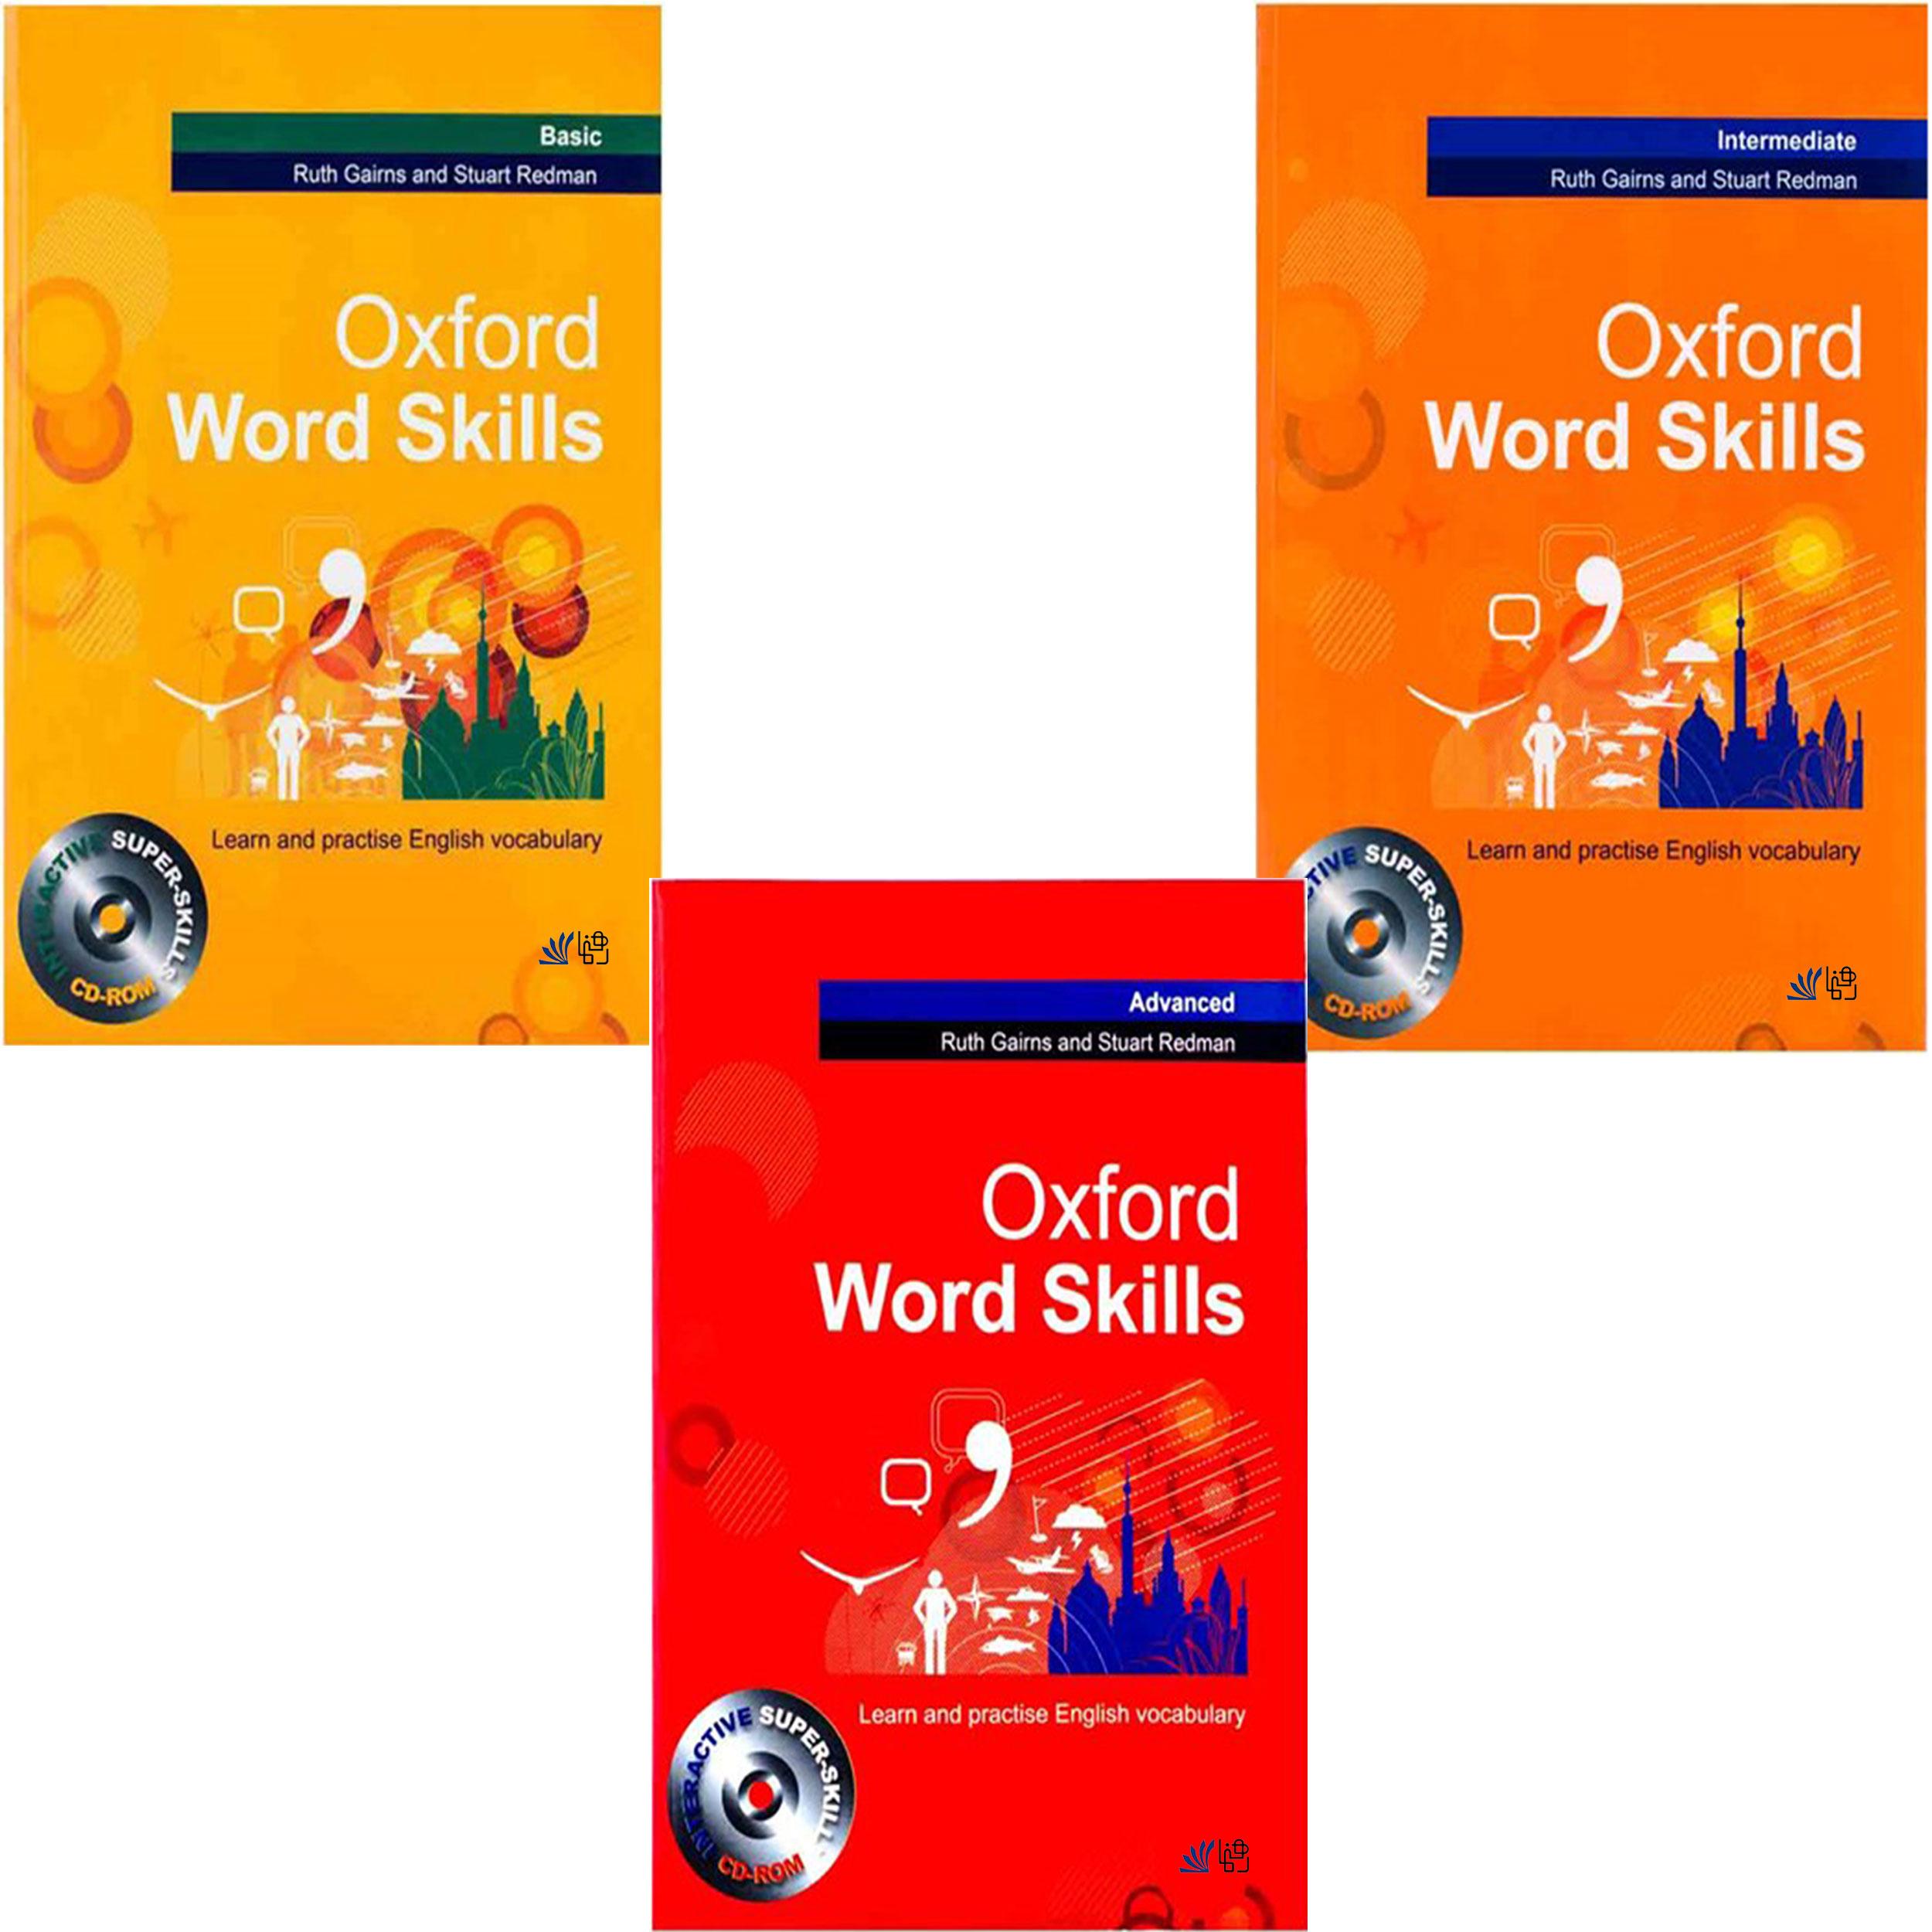 کتاب Oxford Word Skills اثر Ruth Gairns And Stuart Redman انتشارات رهنما 3 جلدی